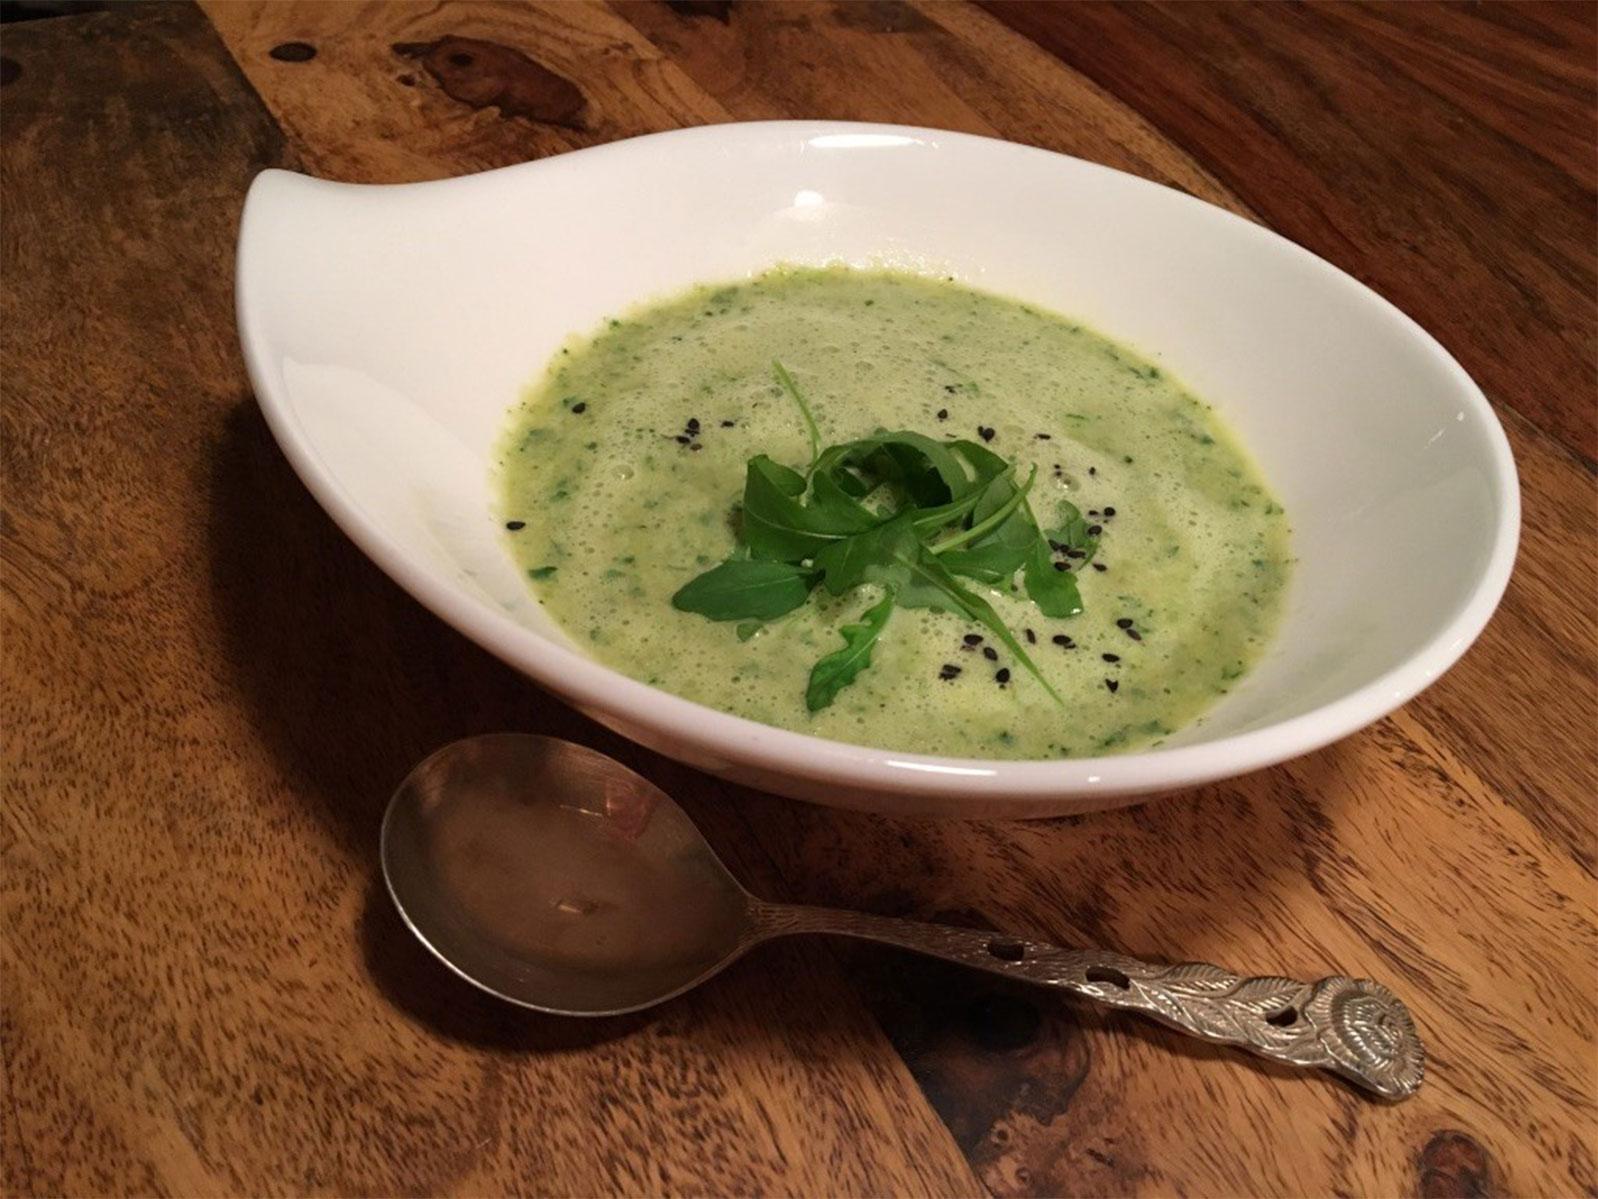 ayurveda suddenrezept von ayurveda at home GREEN SOUP VARIATION